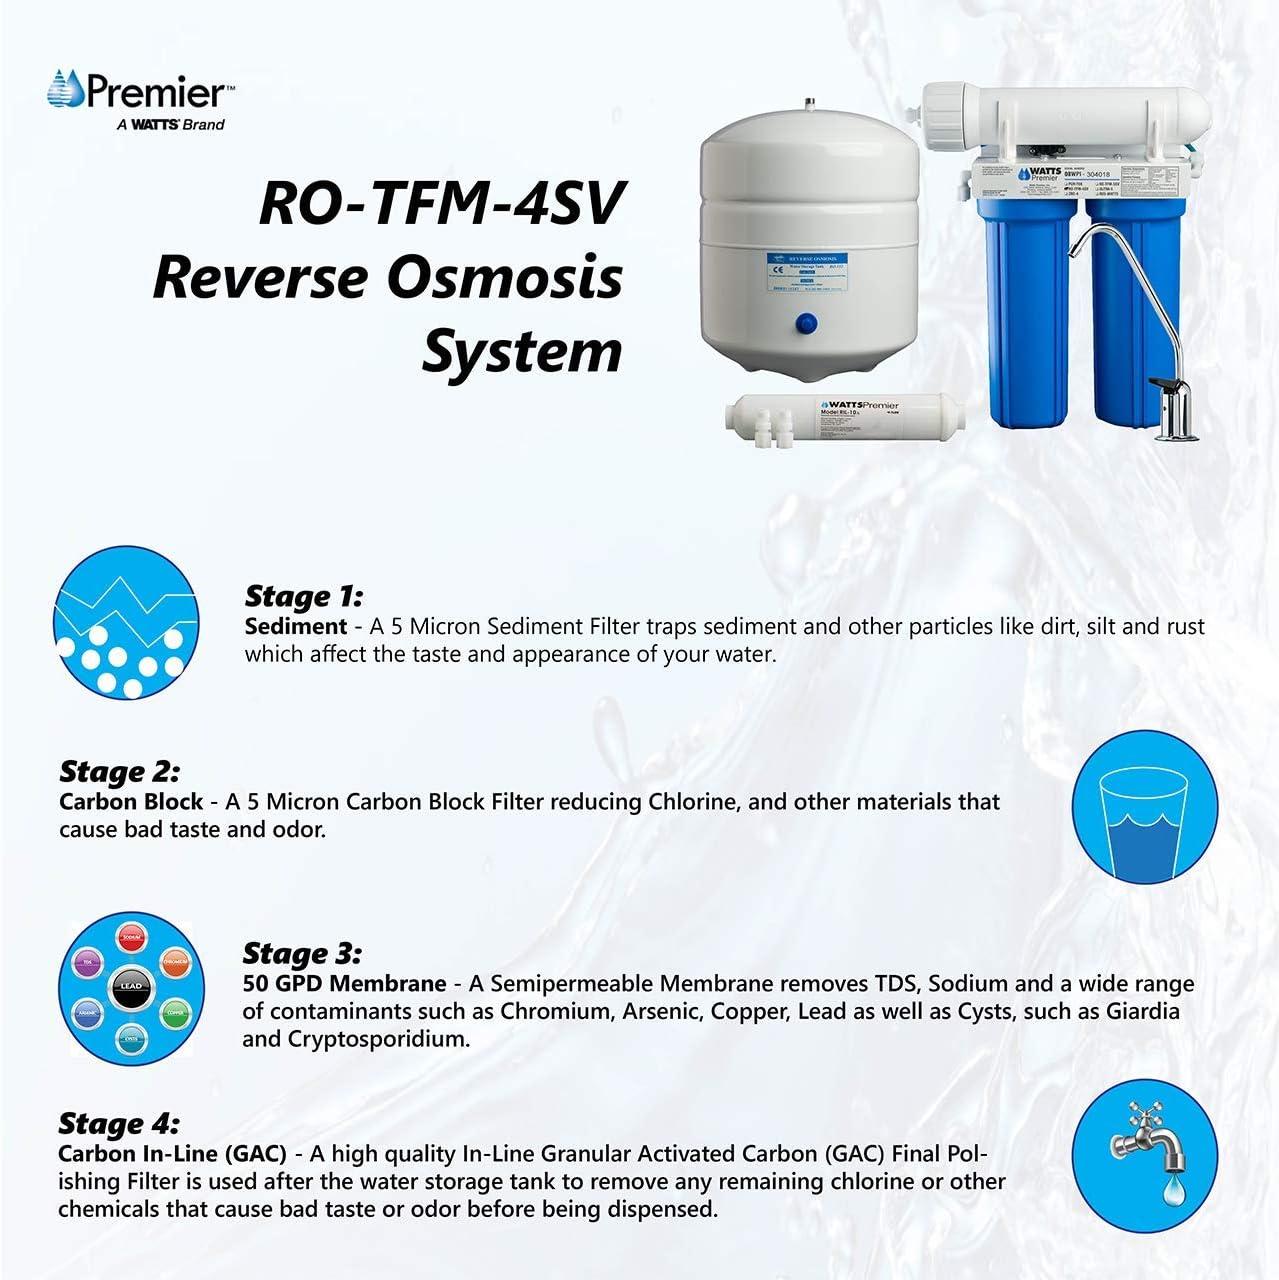 Watts Premier 4SV 500025 Reverse Osmosis System